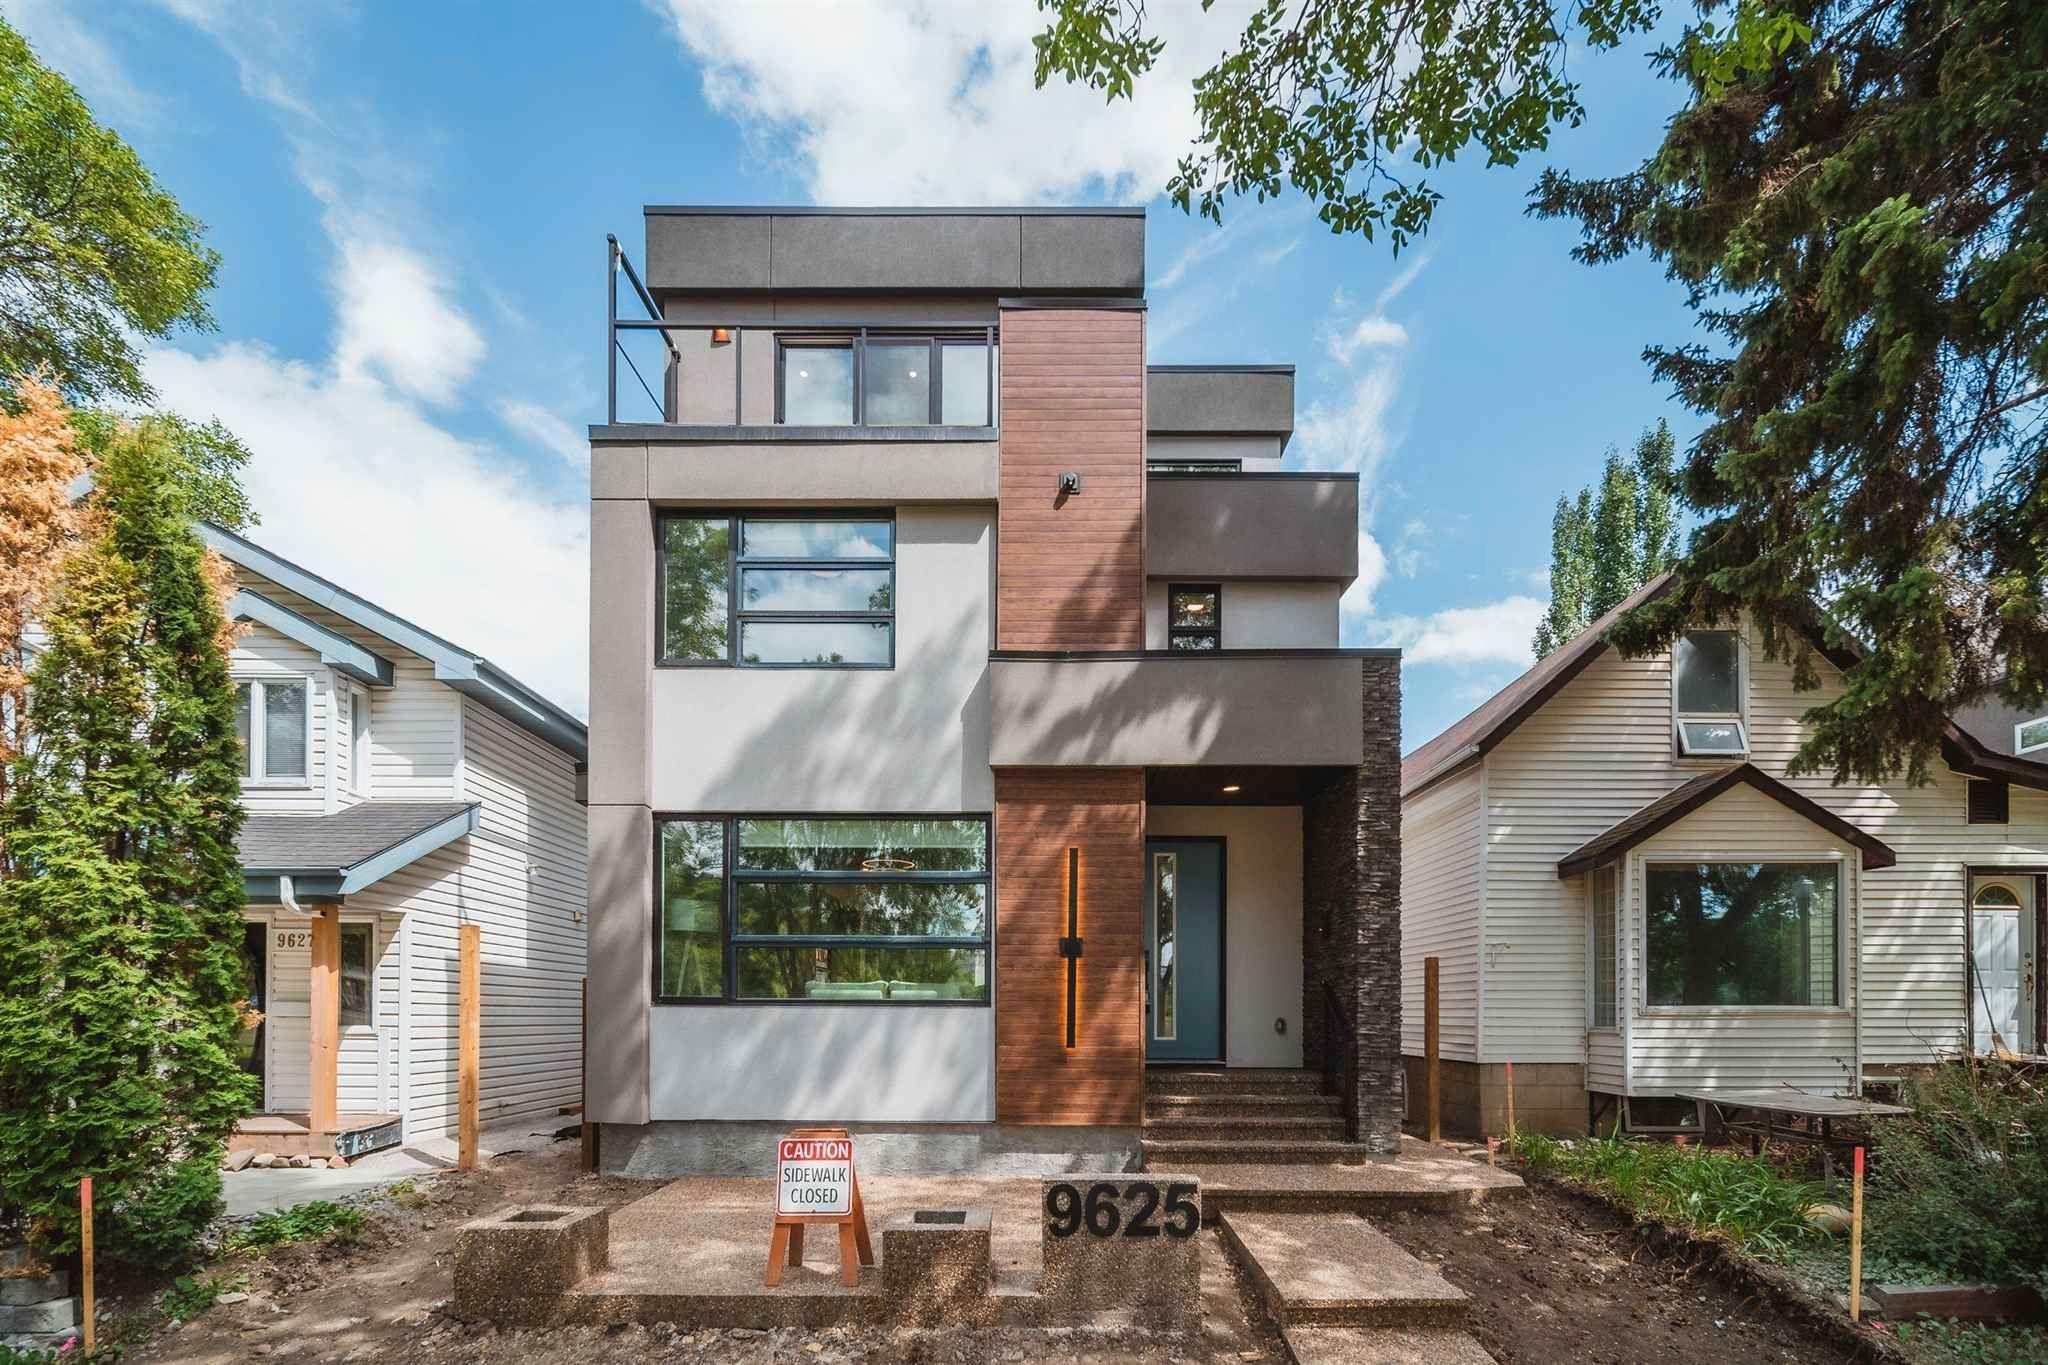 Main Photo: 9625 101 Street in Edmonton: Zone 12 House for sale : MLS®# E4253679